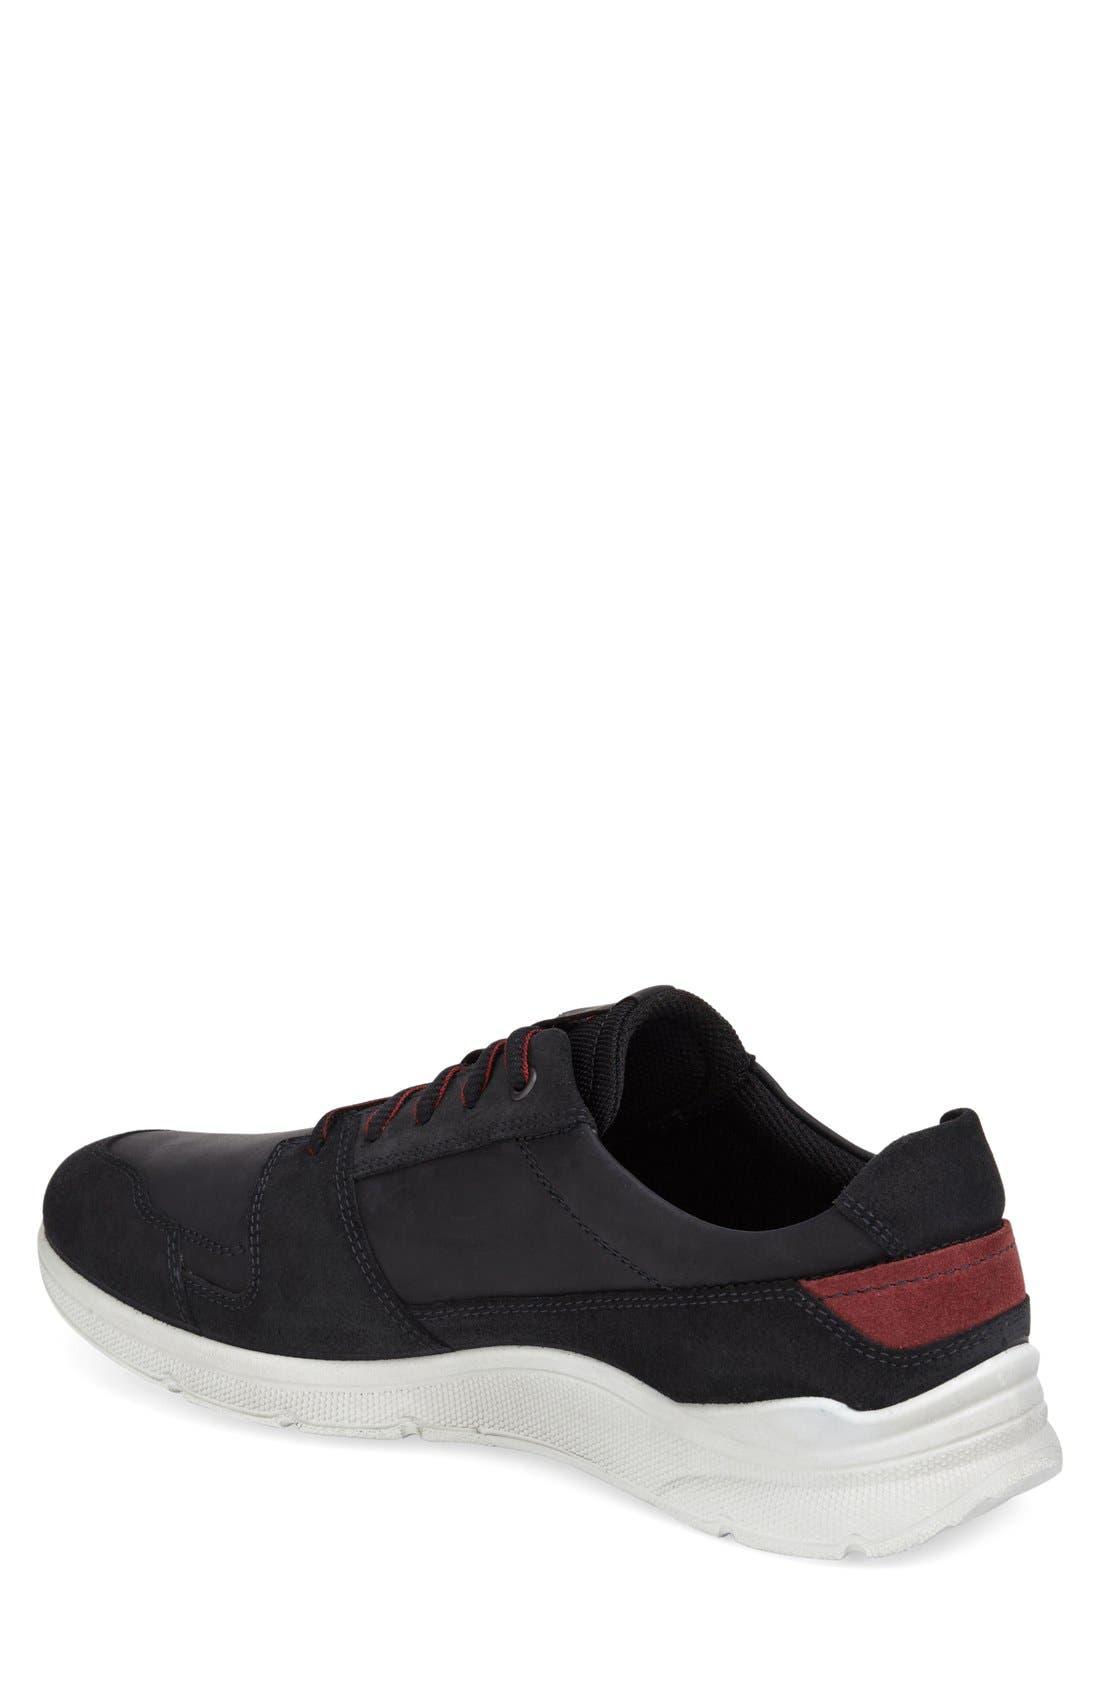 Alternate Image 2  - ECCO 'Irondale - Retro' Sneaker (Men)